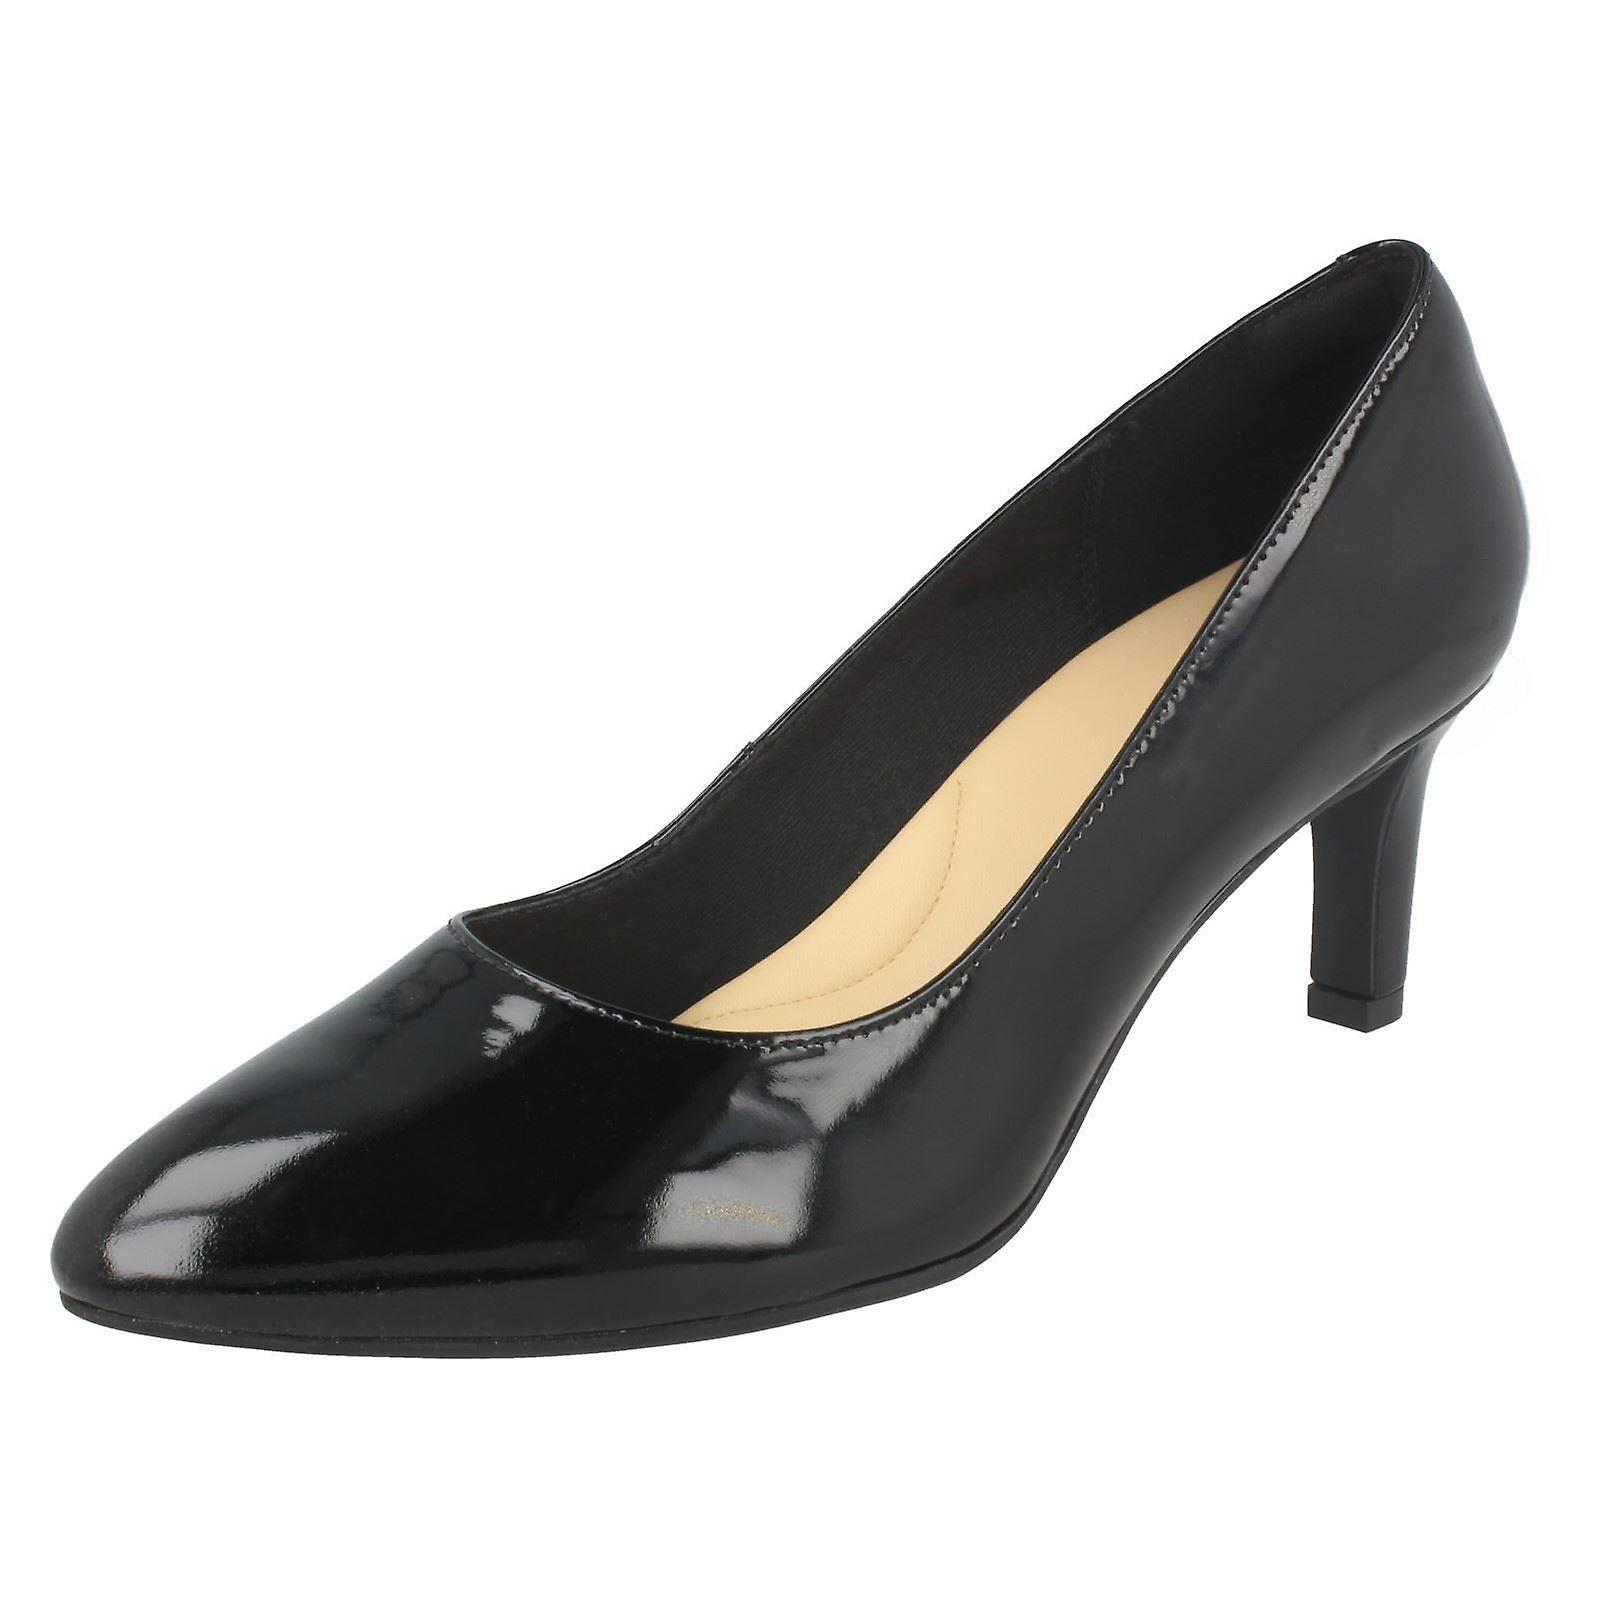 6 40 Patent Size US Size 5E EU Court Ladies Calla Textured Shoes 9W UK Black Size Rose Clarks qOg6v